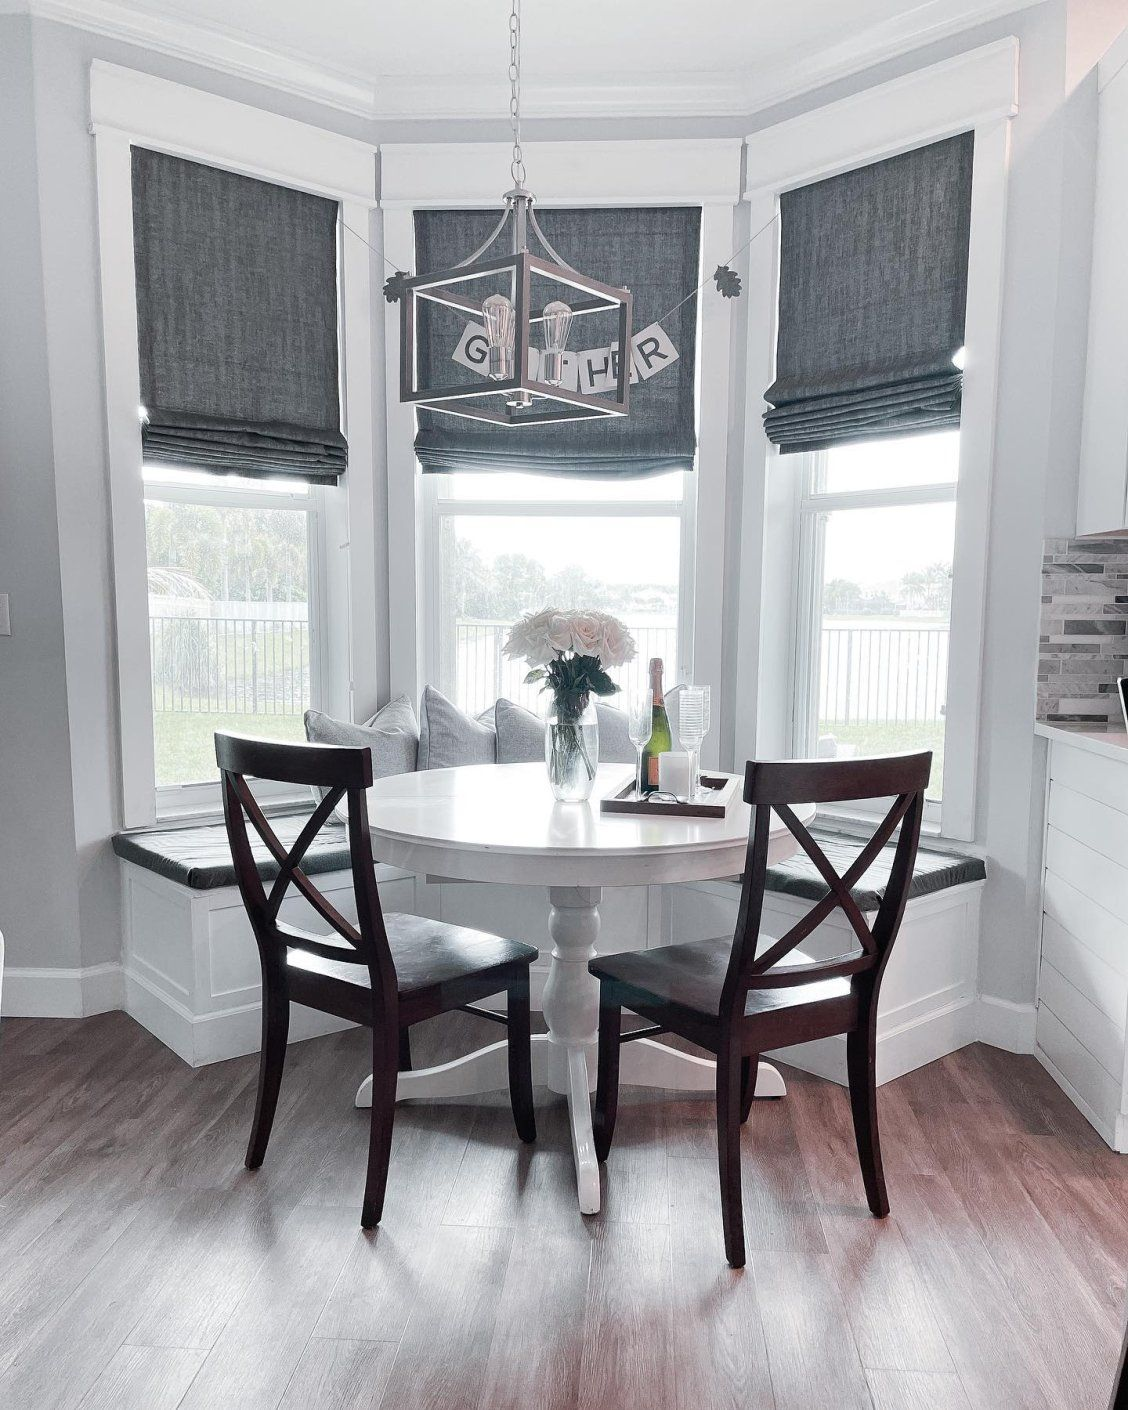 Levolor Roman Shades Blinds Com Dining Room Window Treatments Dining Room Windows Home